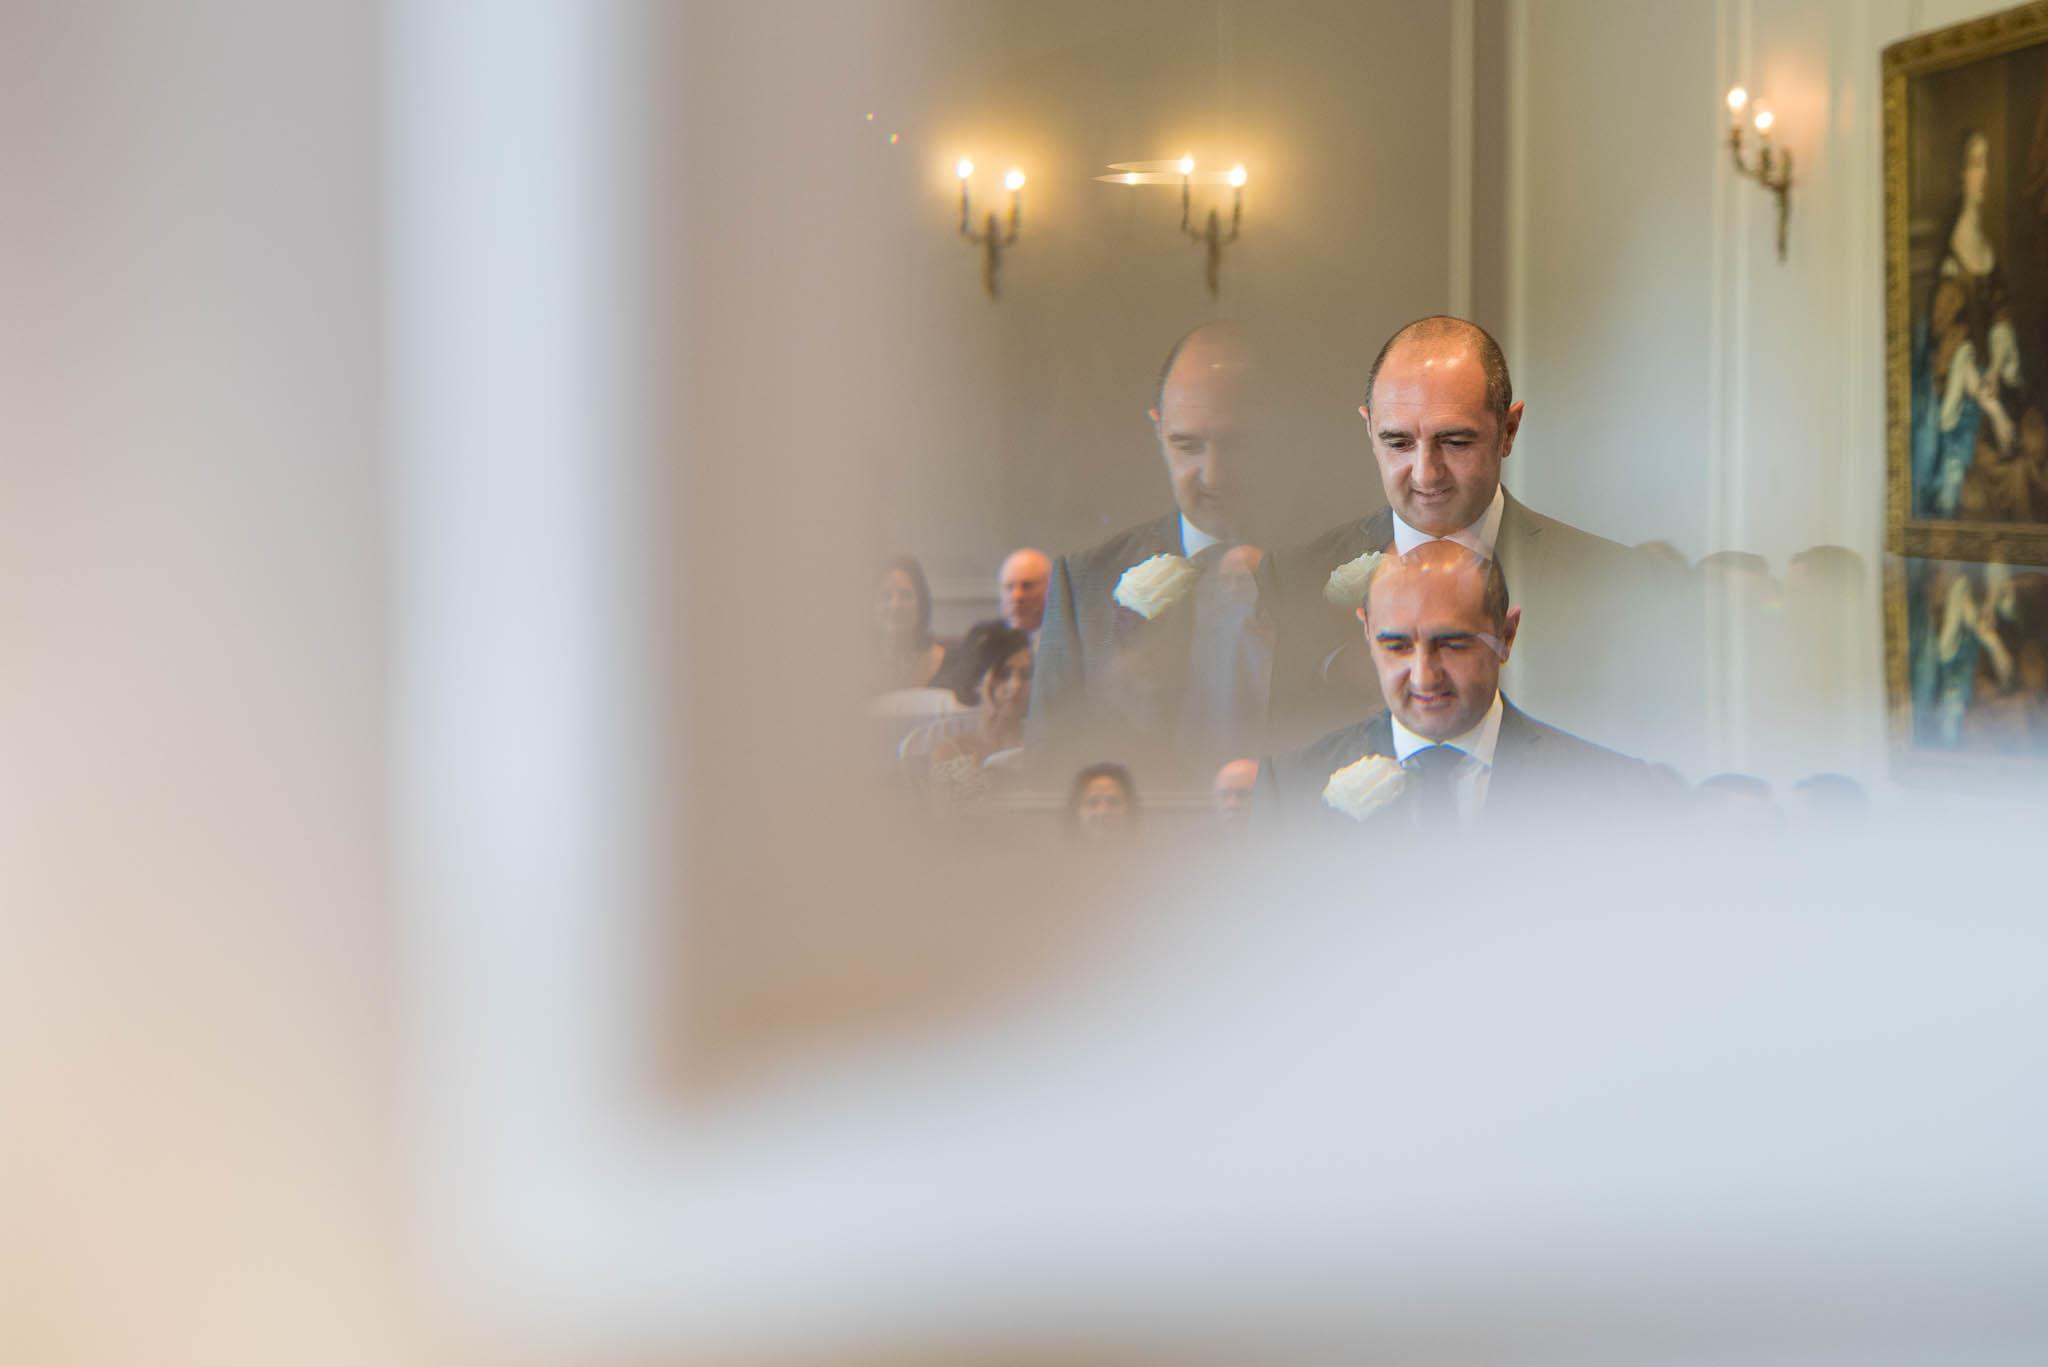 Crathorne Hall Hotel Wedding Photographer50.jpg